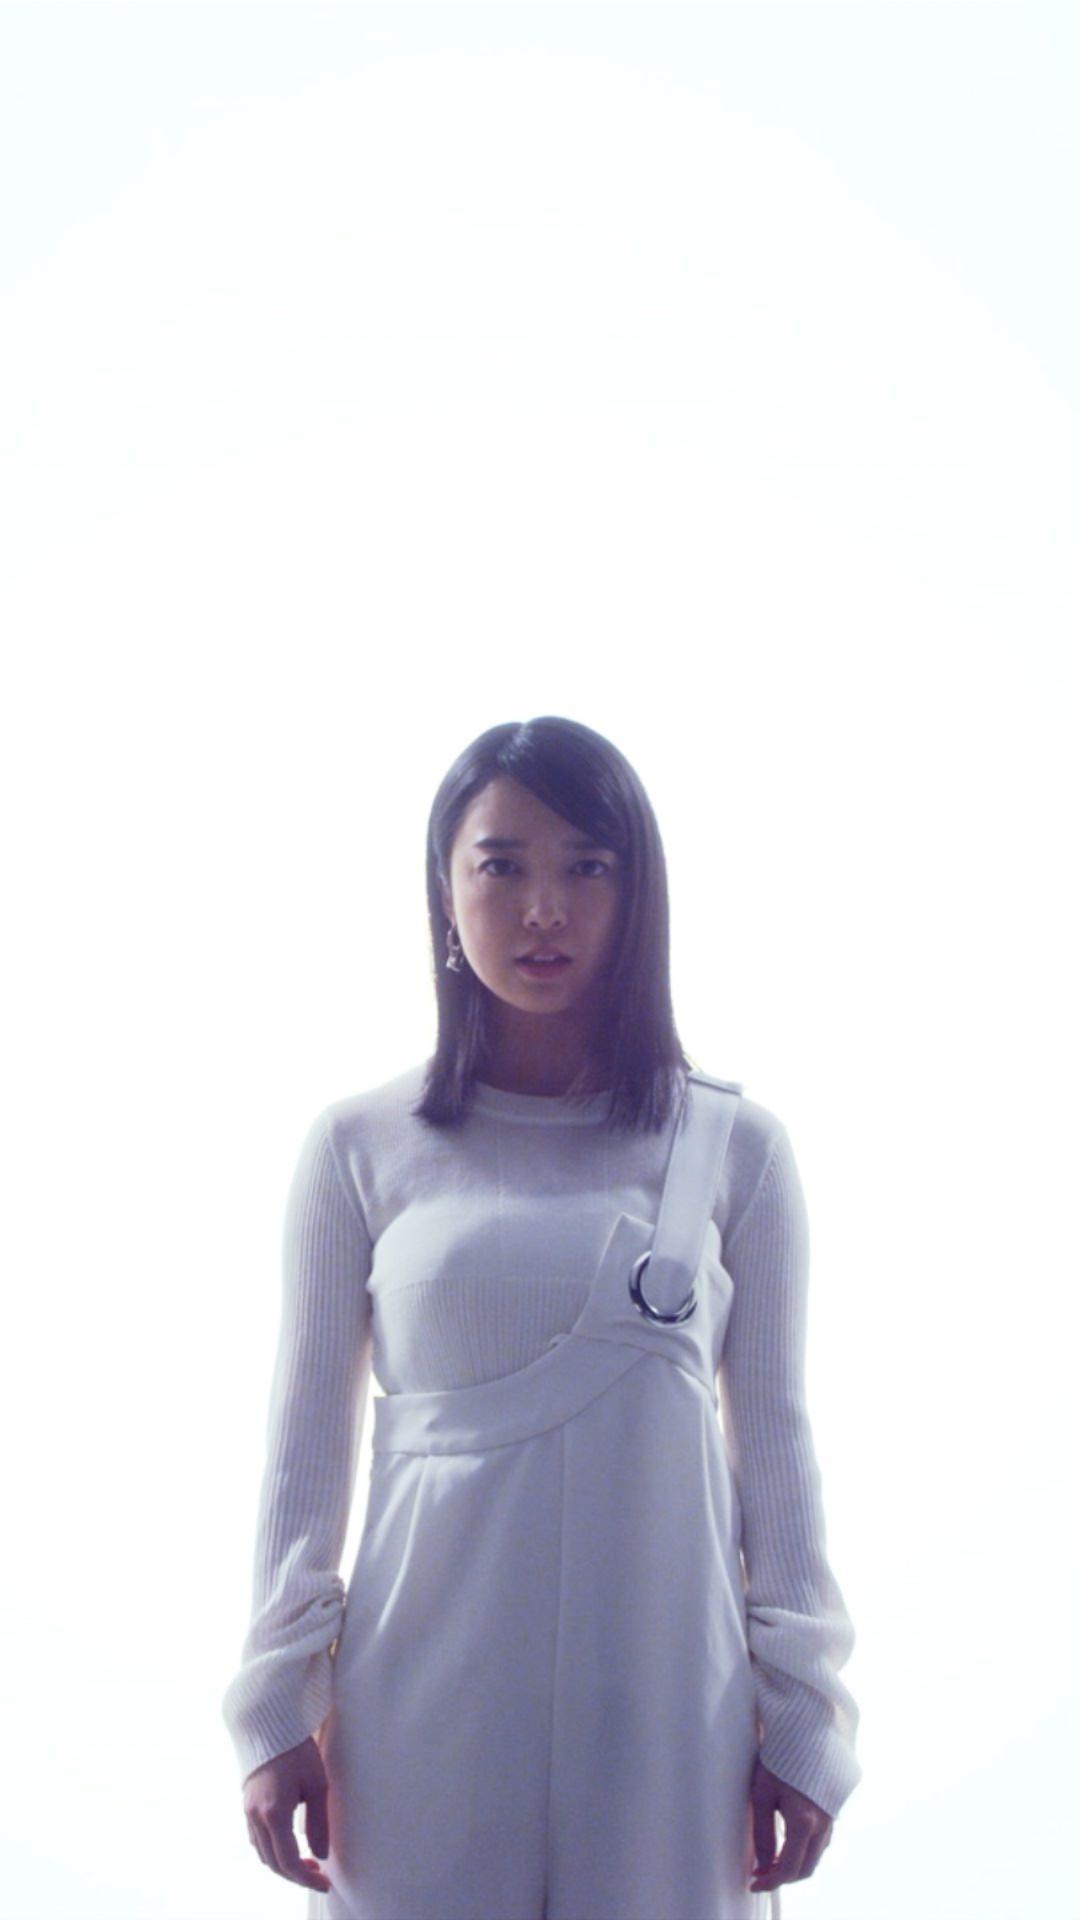 kamisiraishimone11 - 上白石萌音のかわいい💓高画質スマホ壁紙17枚 [iPhone&Androidに対応]